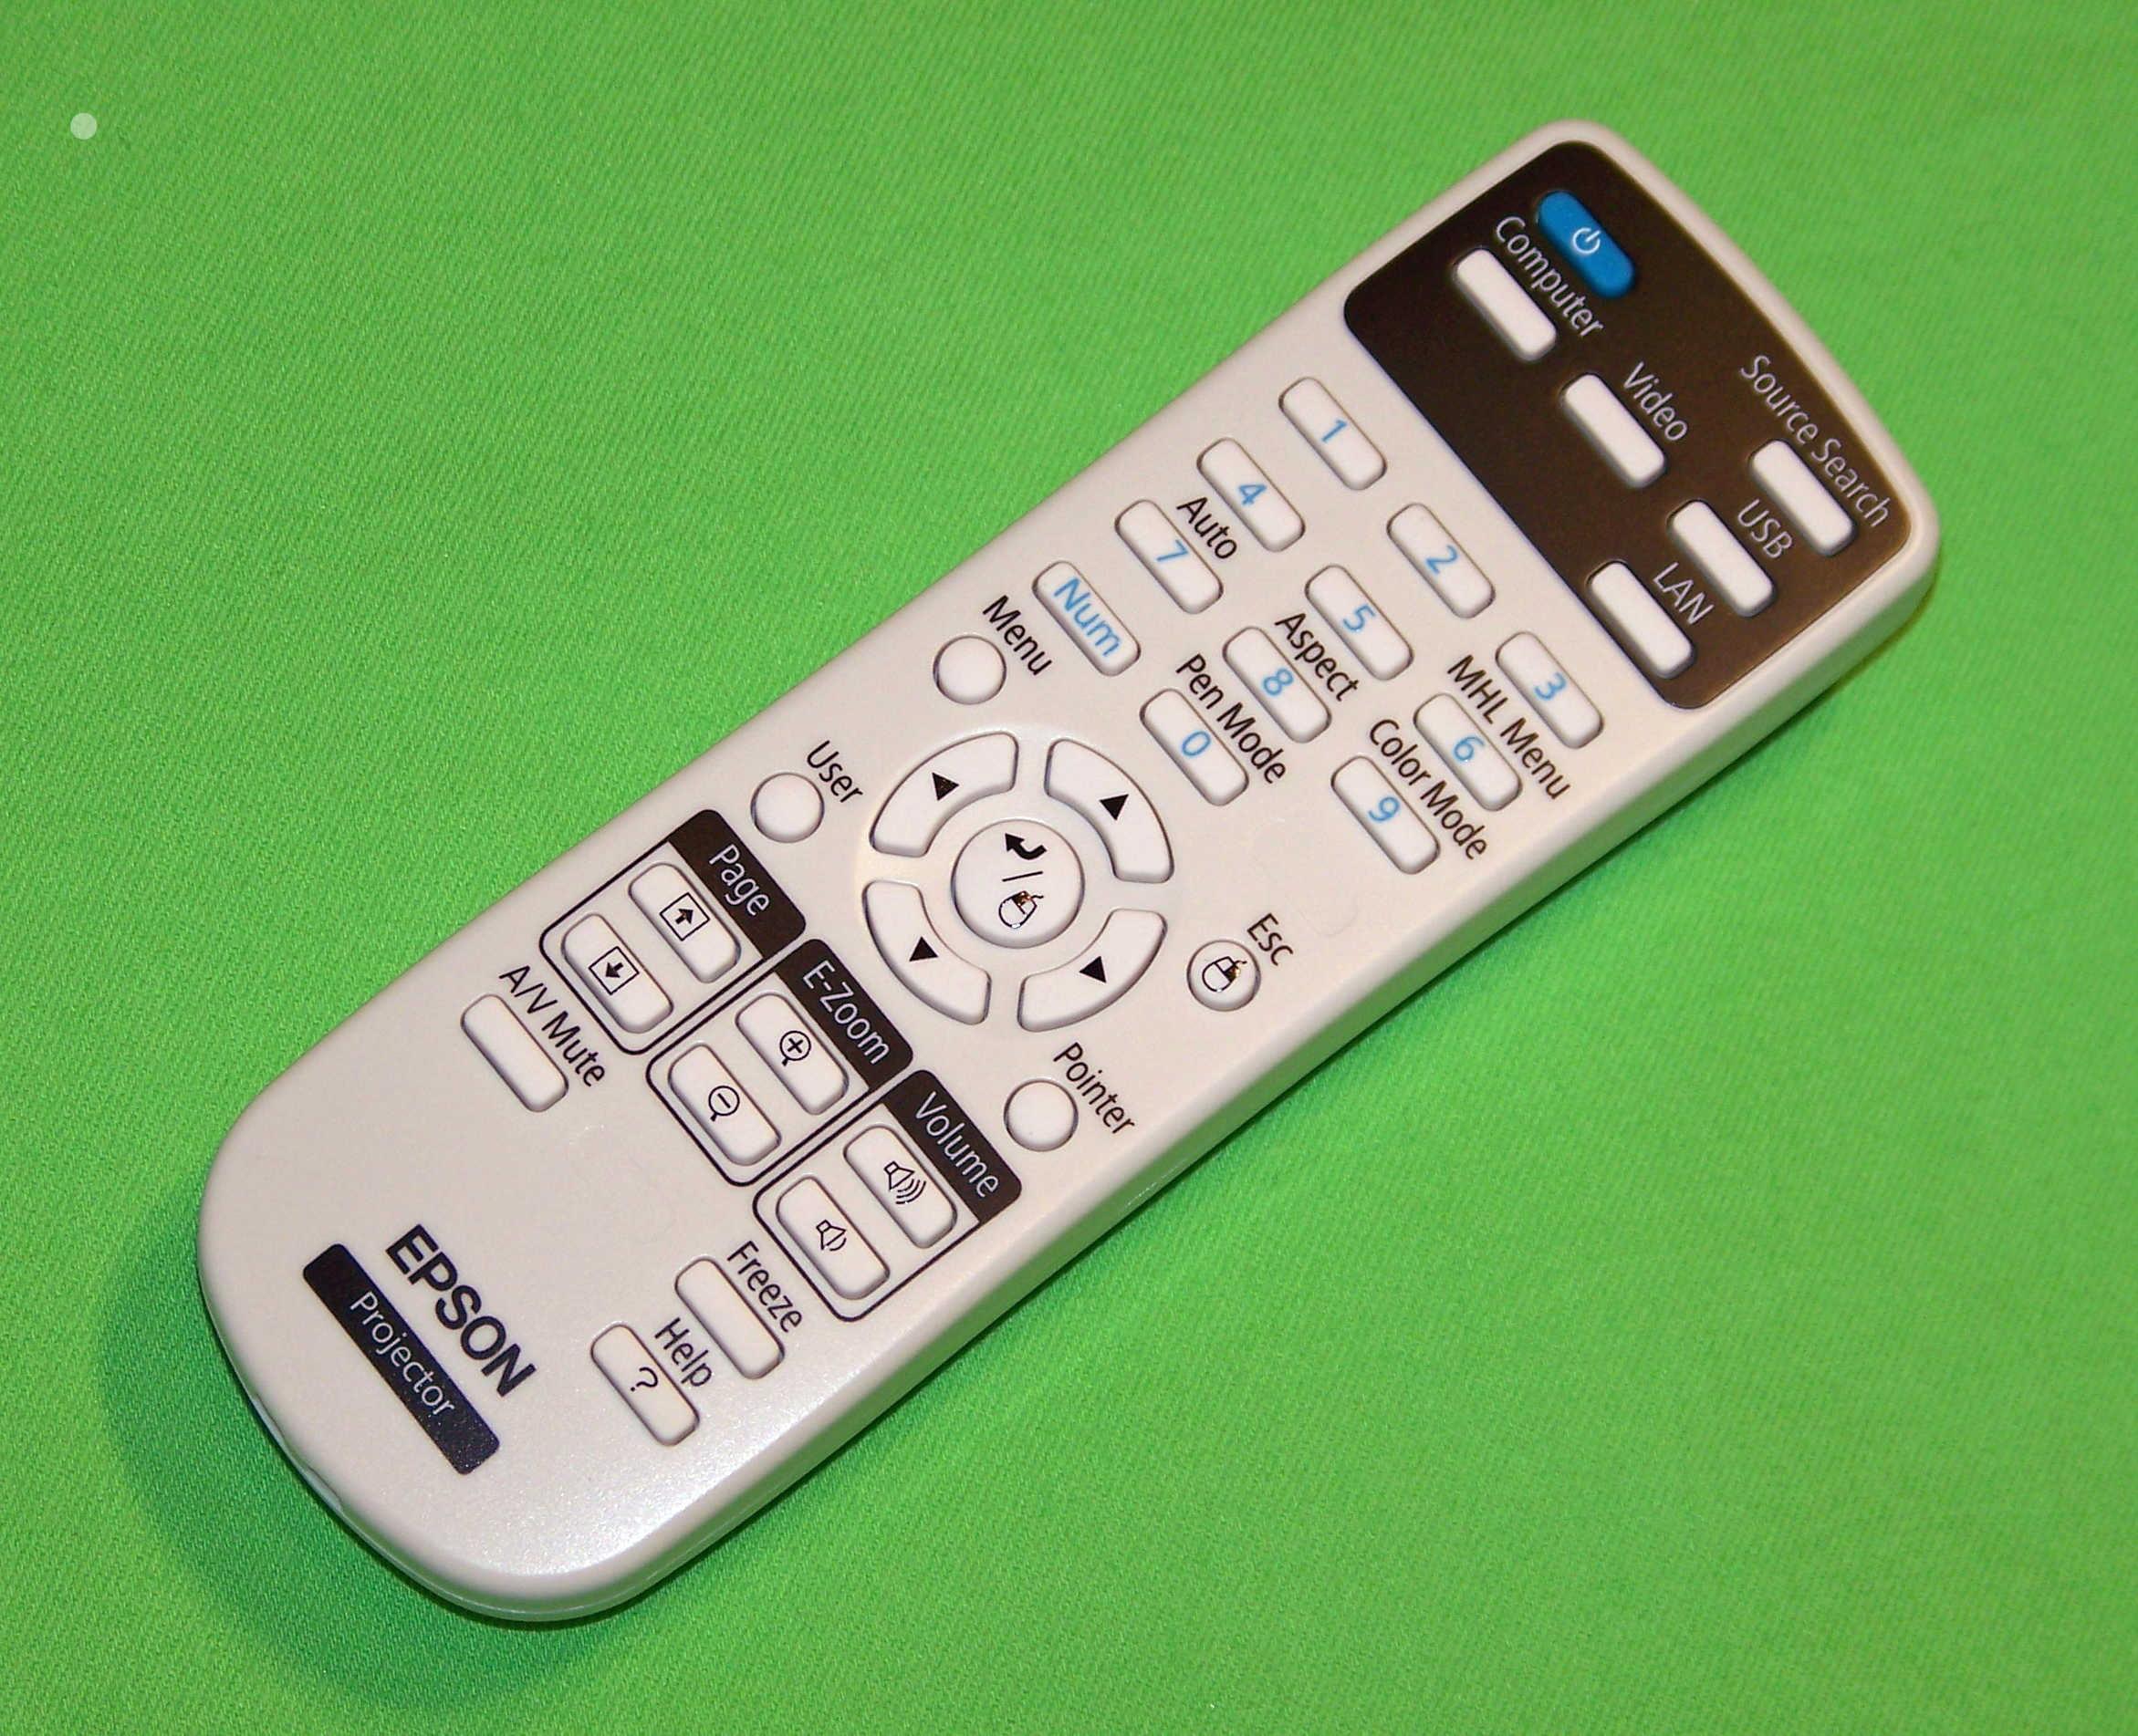 Epson Remote Control Shipped With H291a H292a H336a H419a H416a H337a H373a